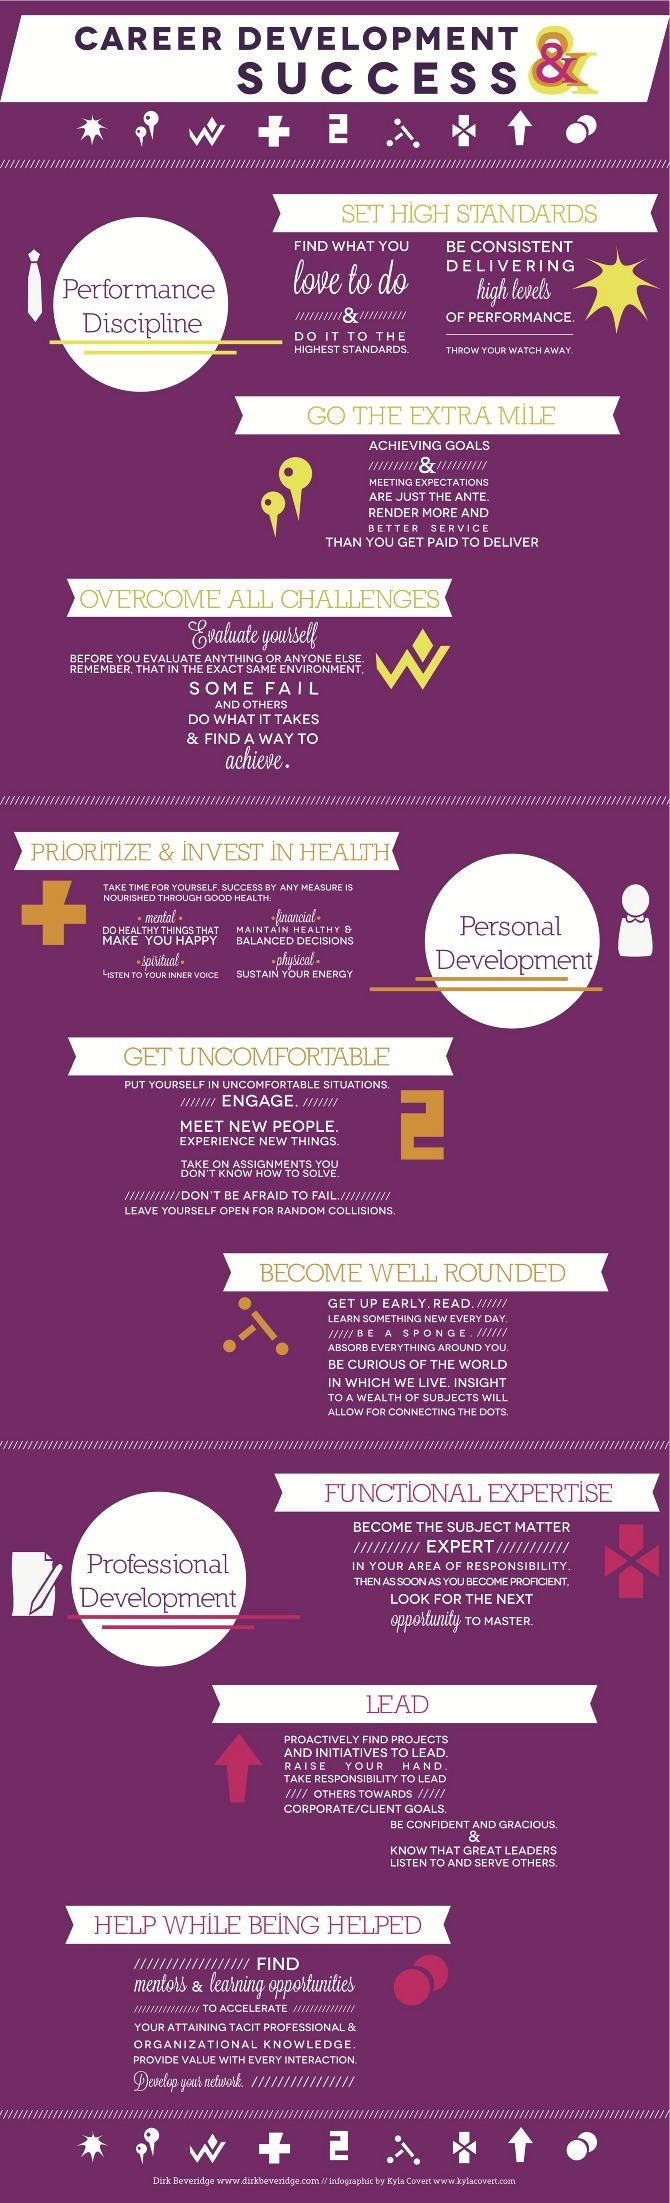 Career Development Facts